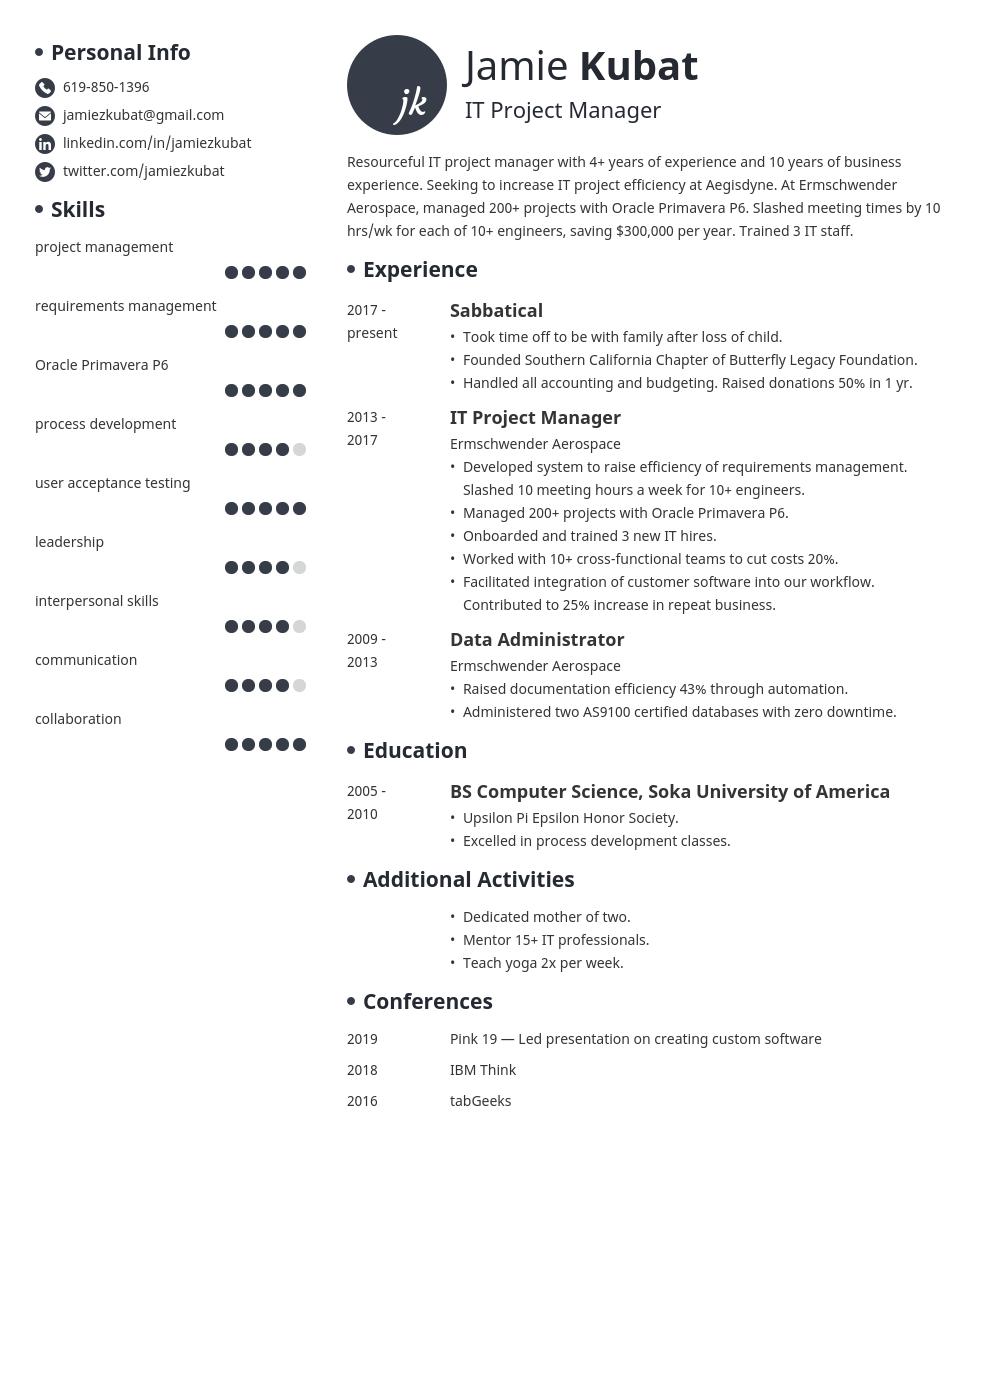 resume employment gaps template initials